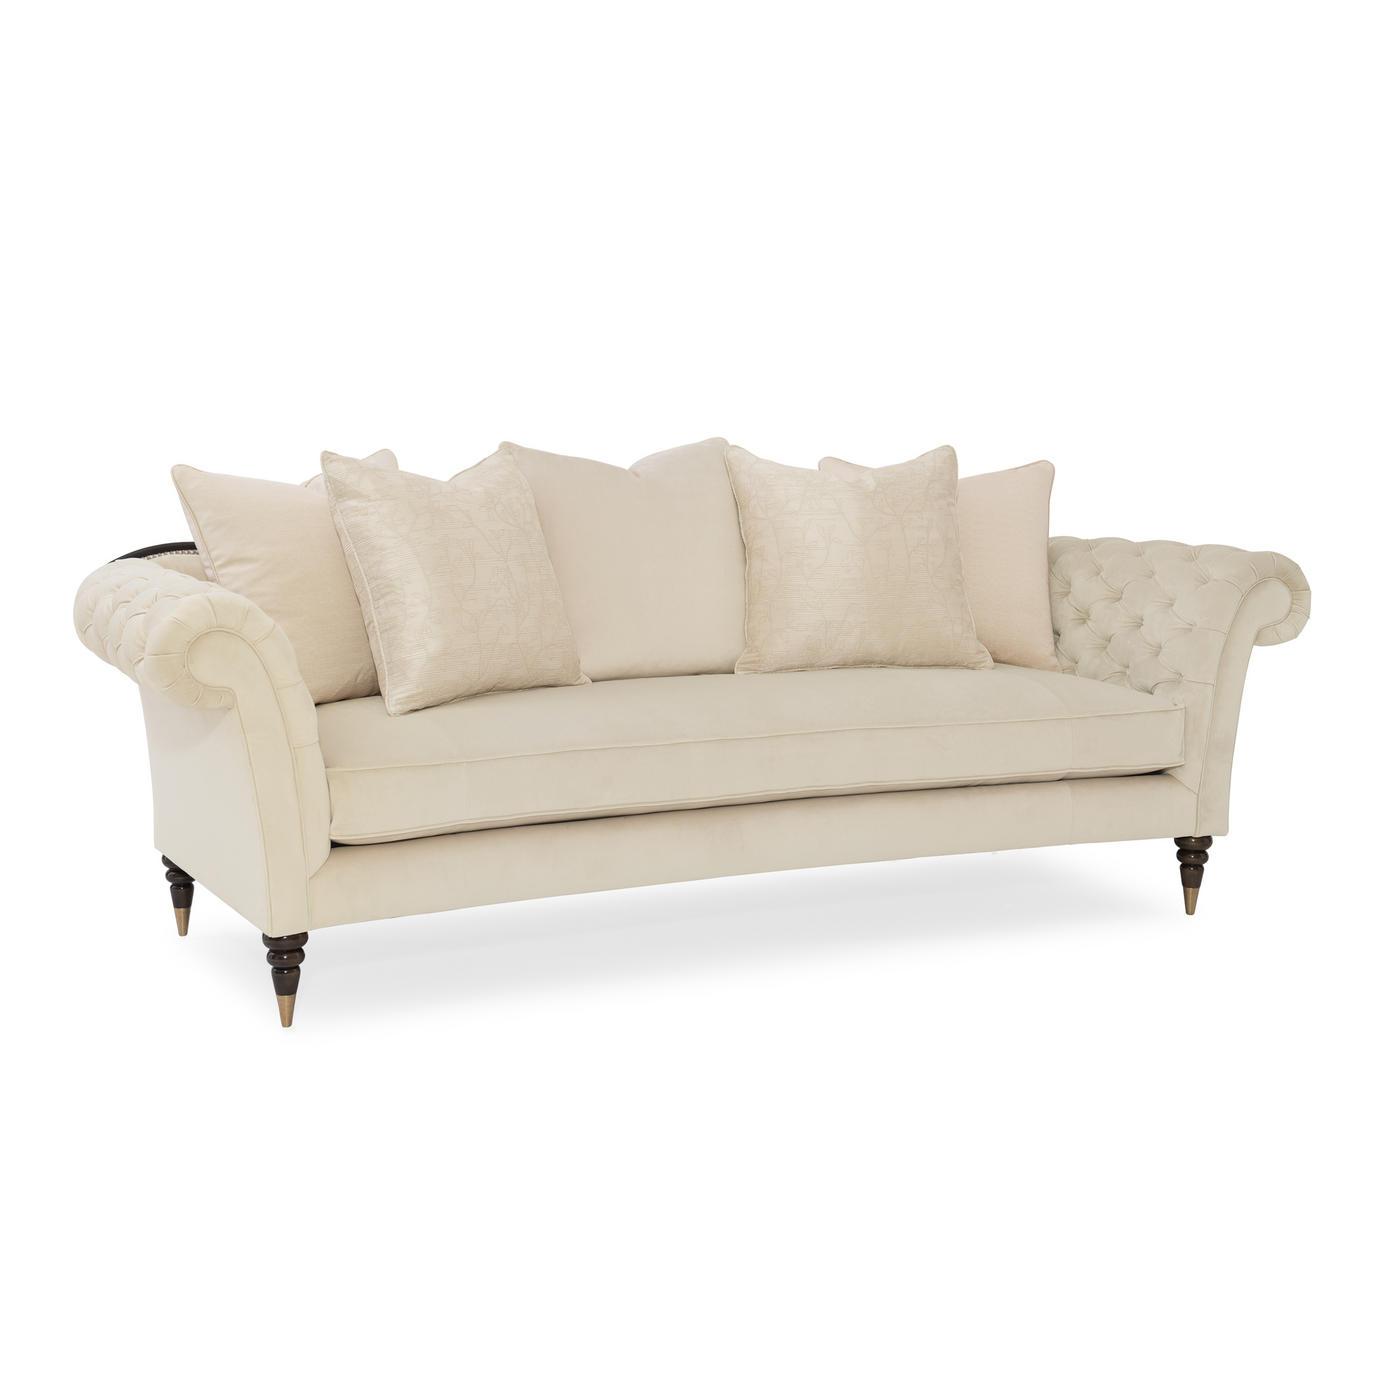 schnadig sofa 9090 wood design ideas review home co